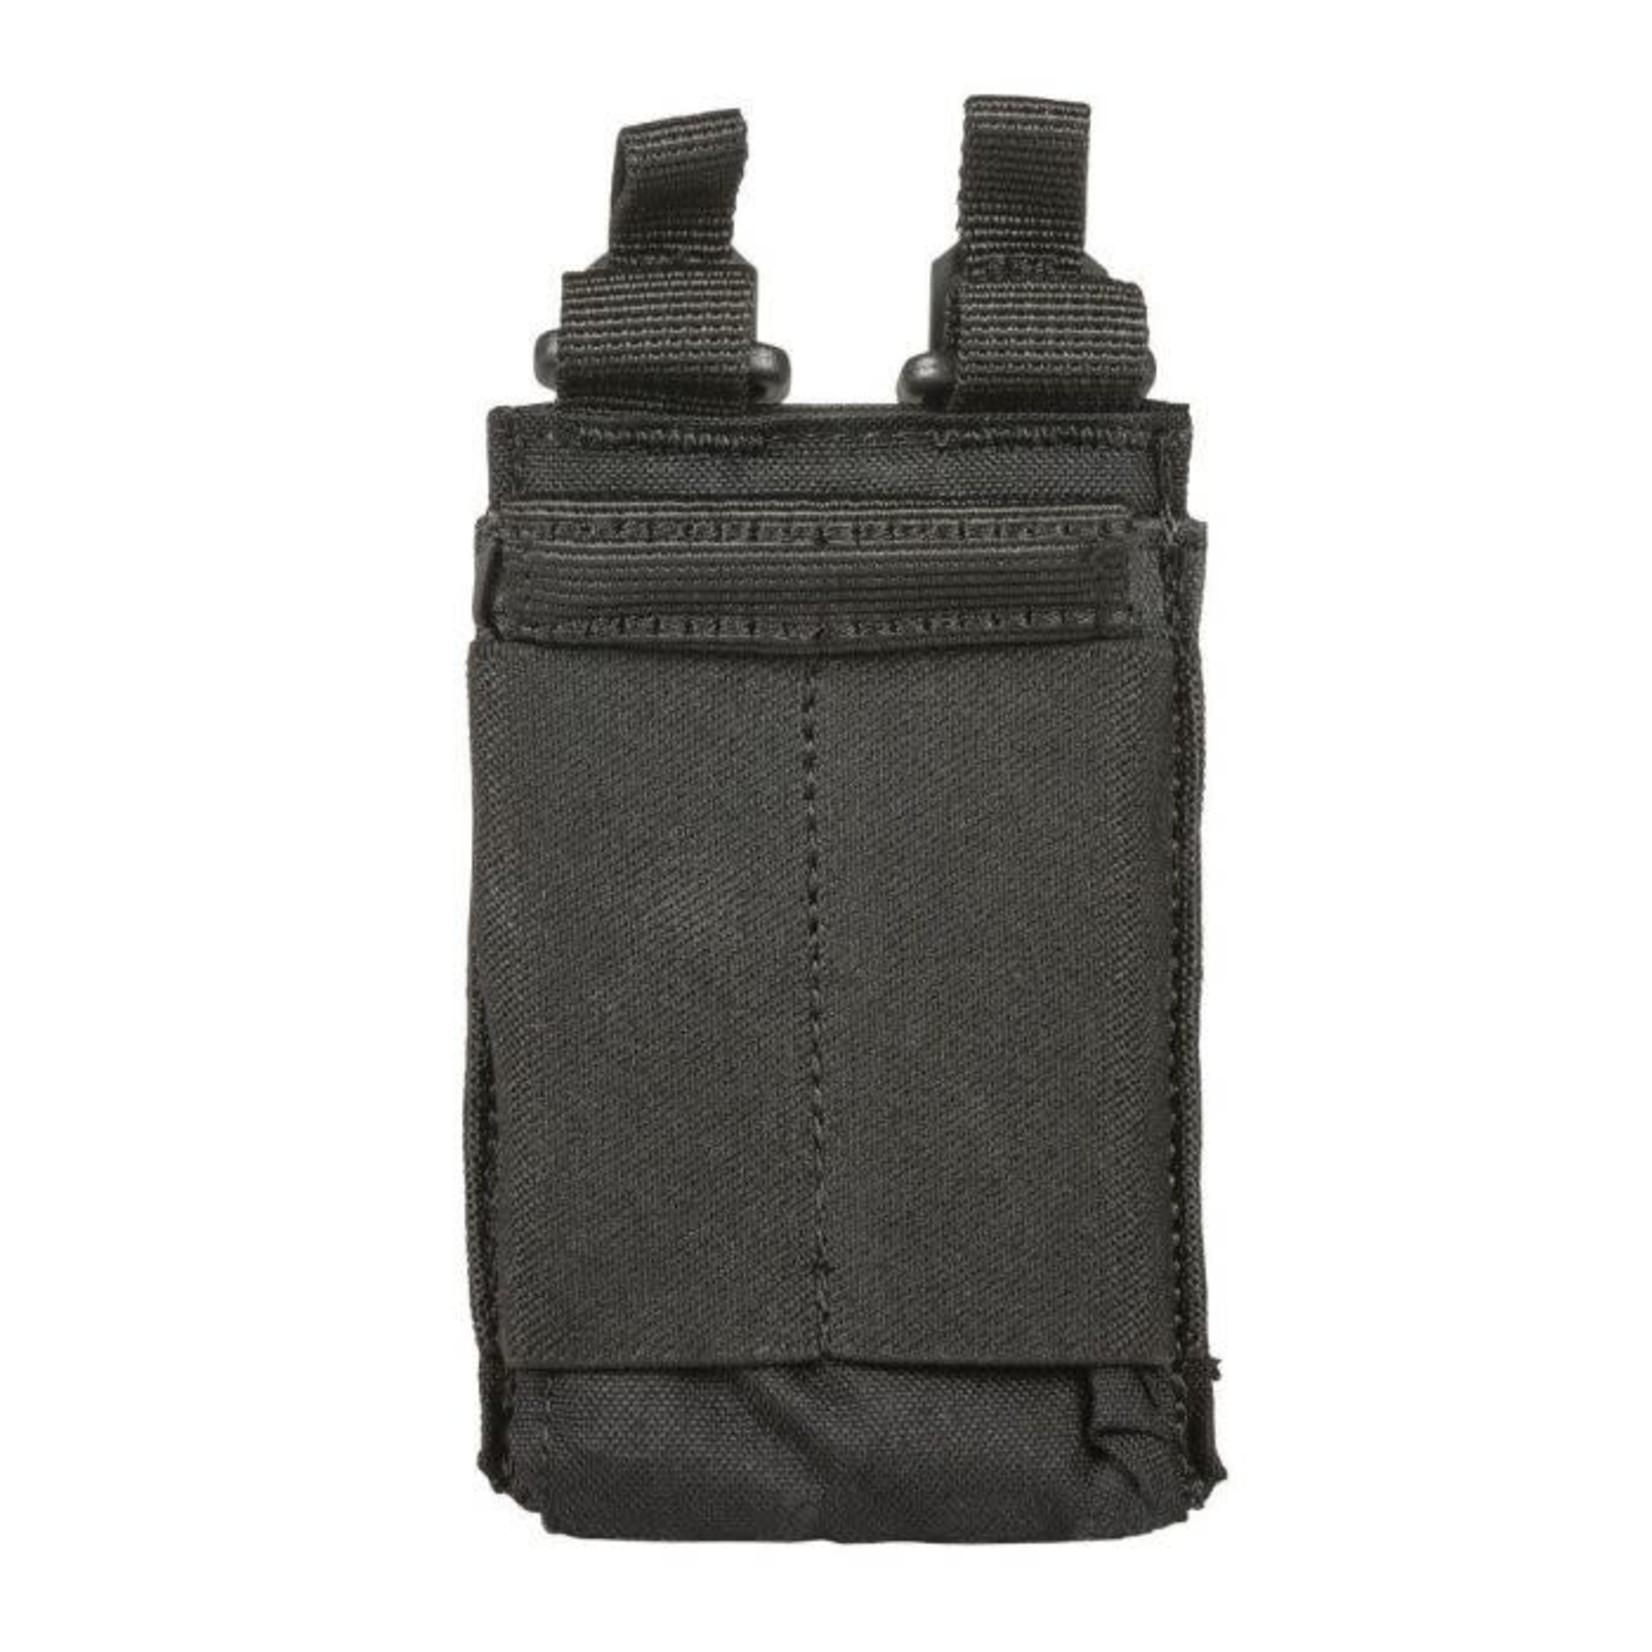 5.11 Tactical 5.11 Flex Single AR Mag Pouch